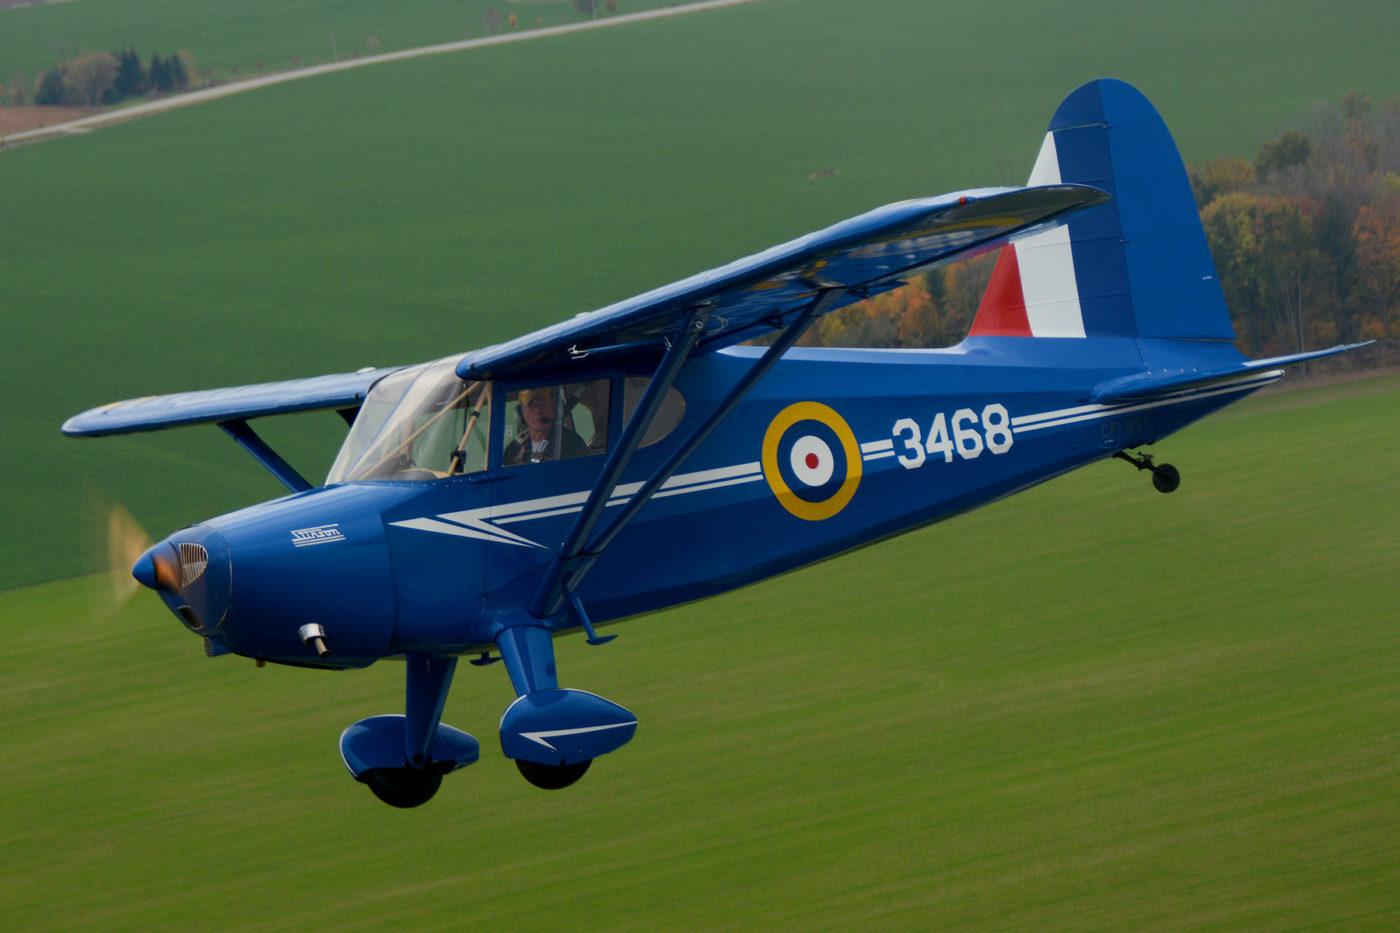 Murray Kot flying his 1939 ex-RCAF Stinson HW-75 (105) Voyager. Eric Dumigan Photo